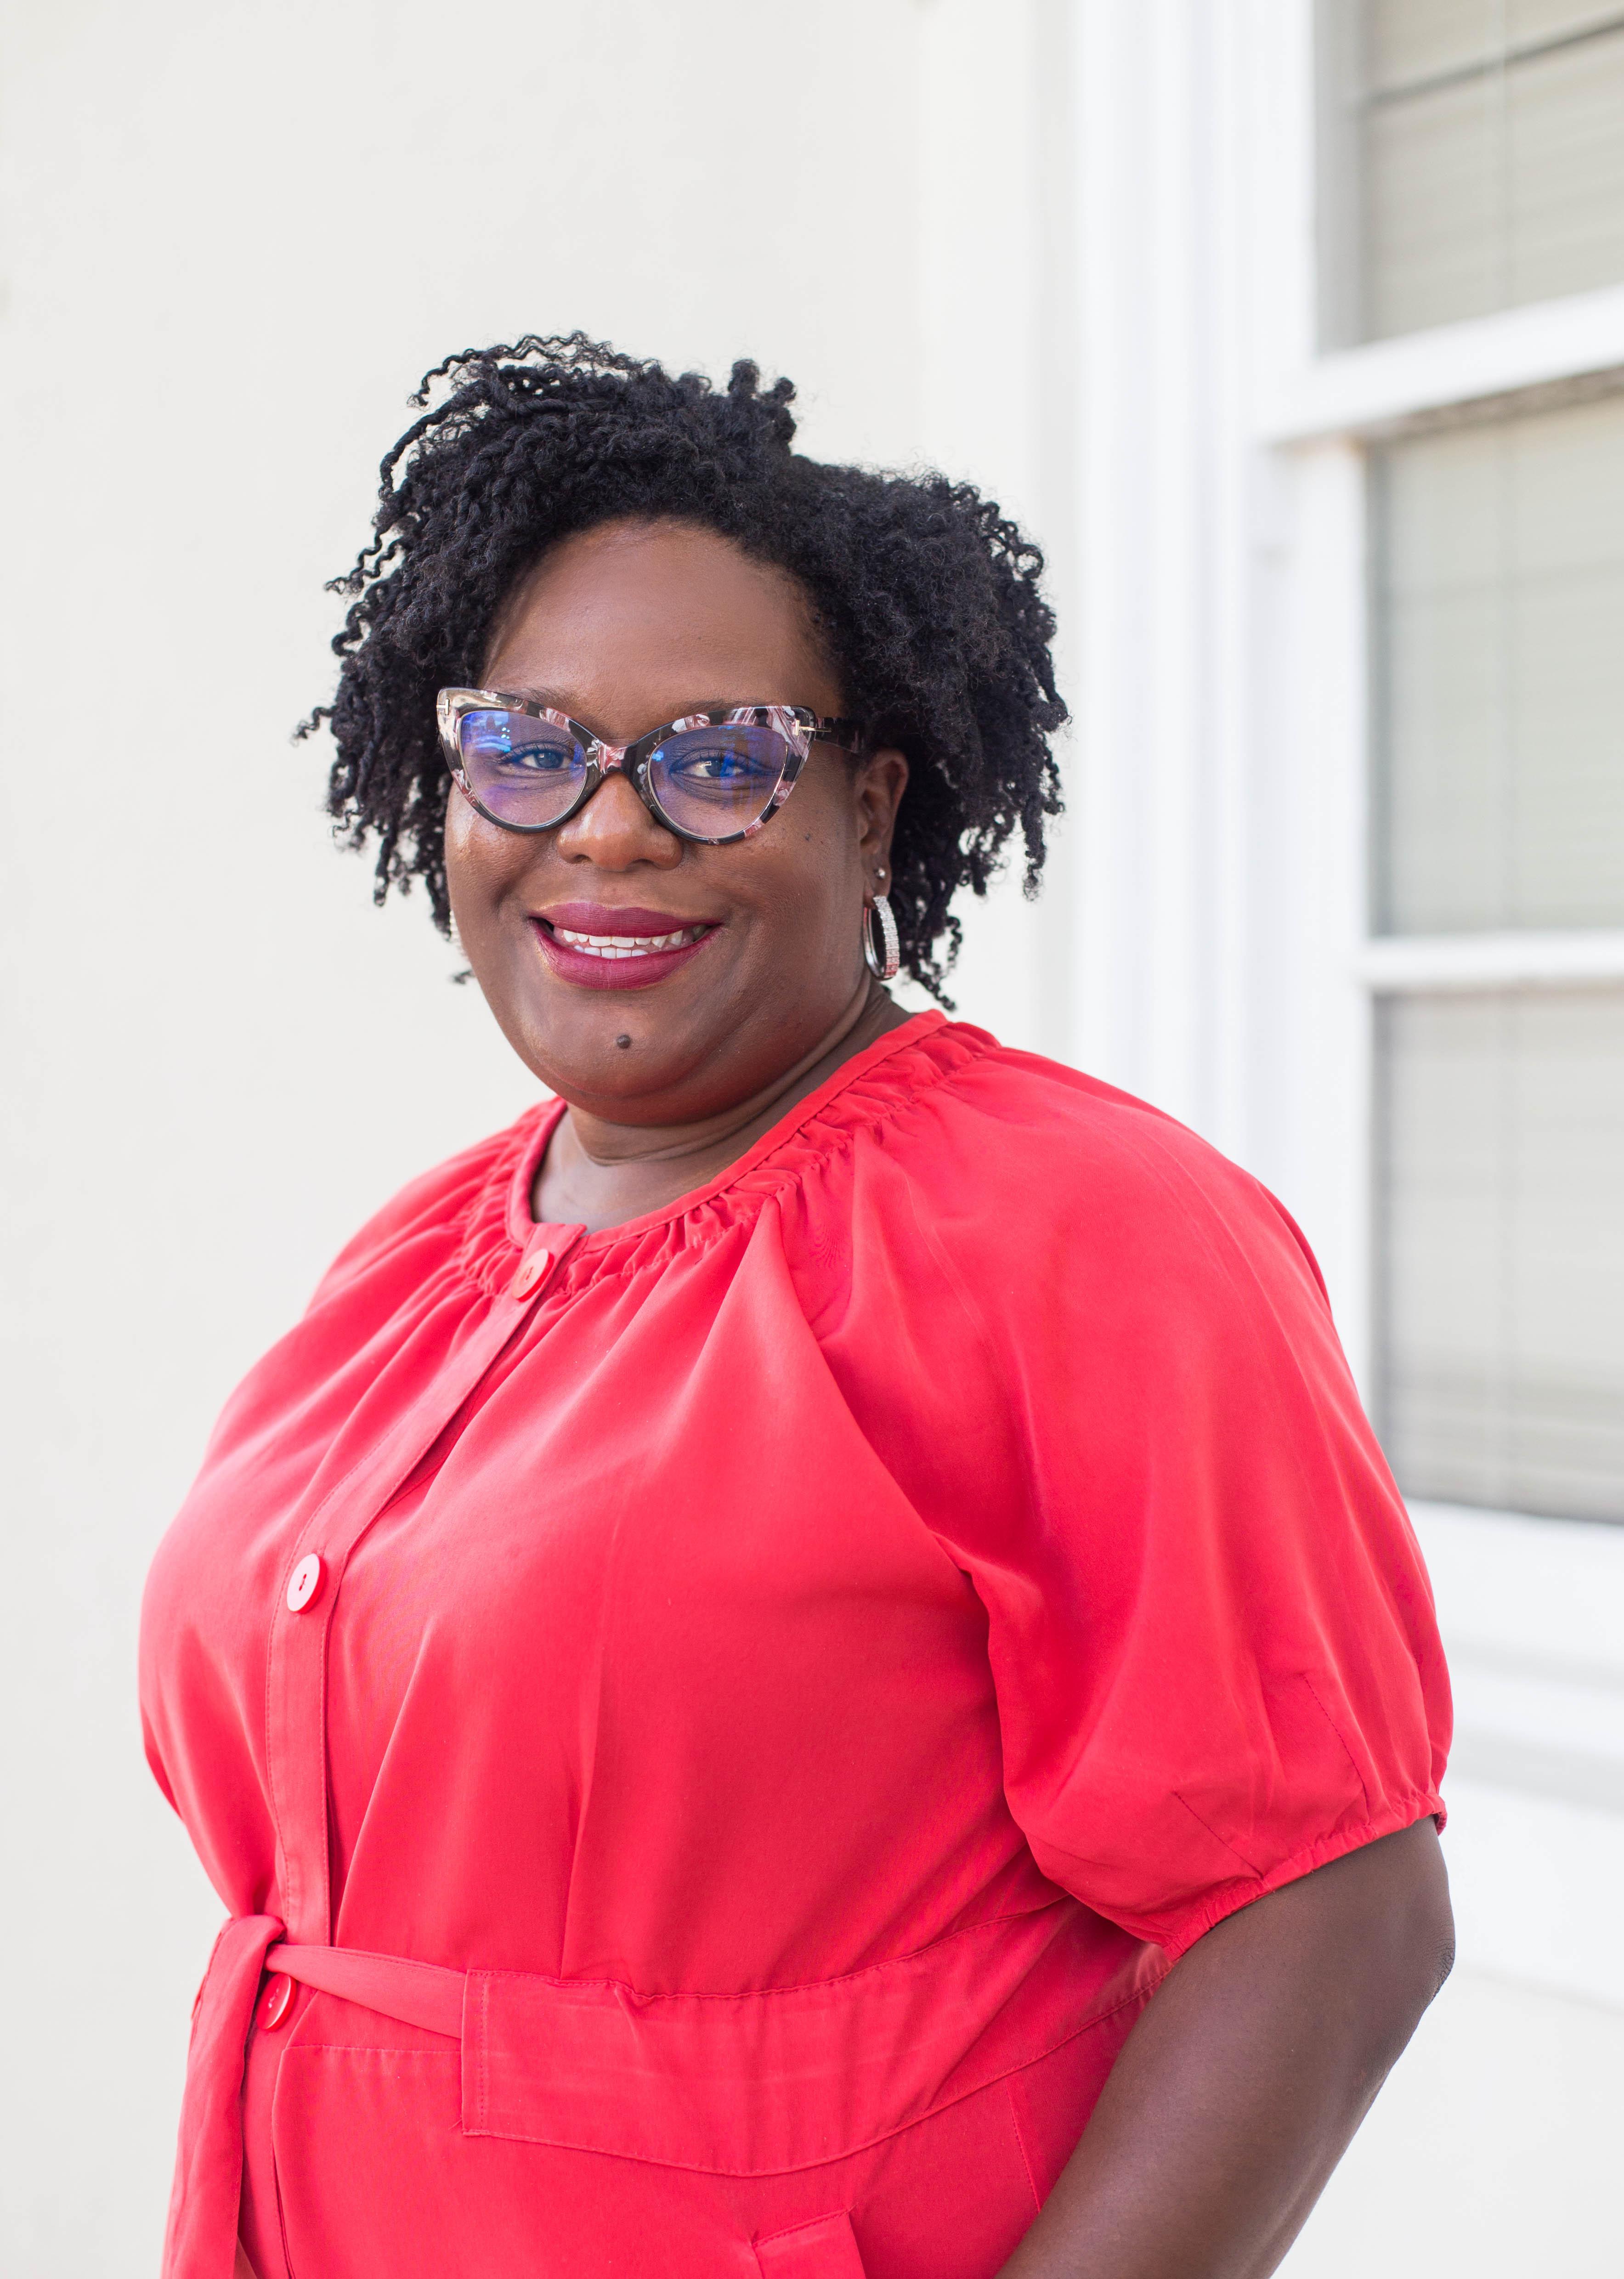 Keyshia E. Sanders, Constituent Services Manager